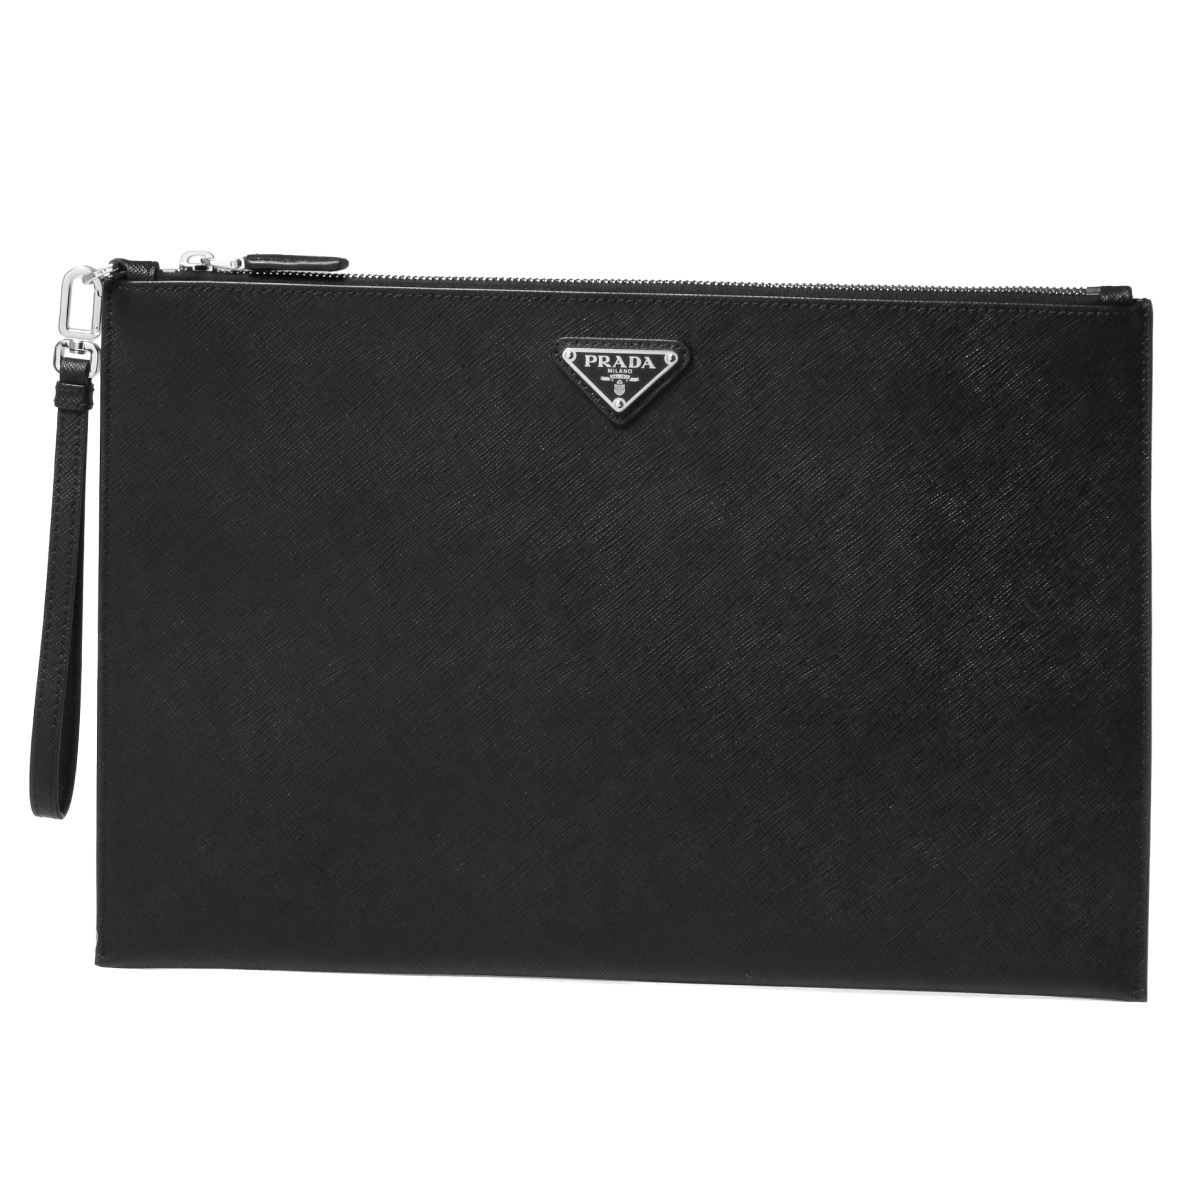 8dc99ac57652 importshopdouble  Prada PRADA bag men 2NH001 PN9 F0002 clutch bag ...